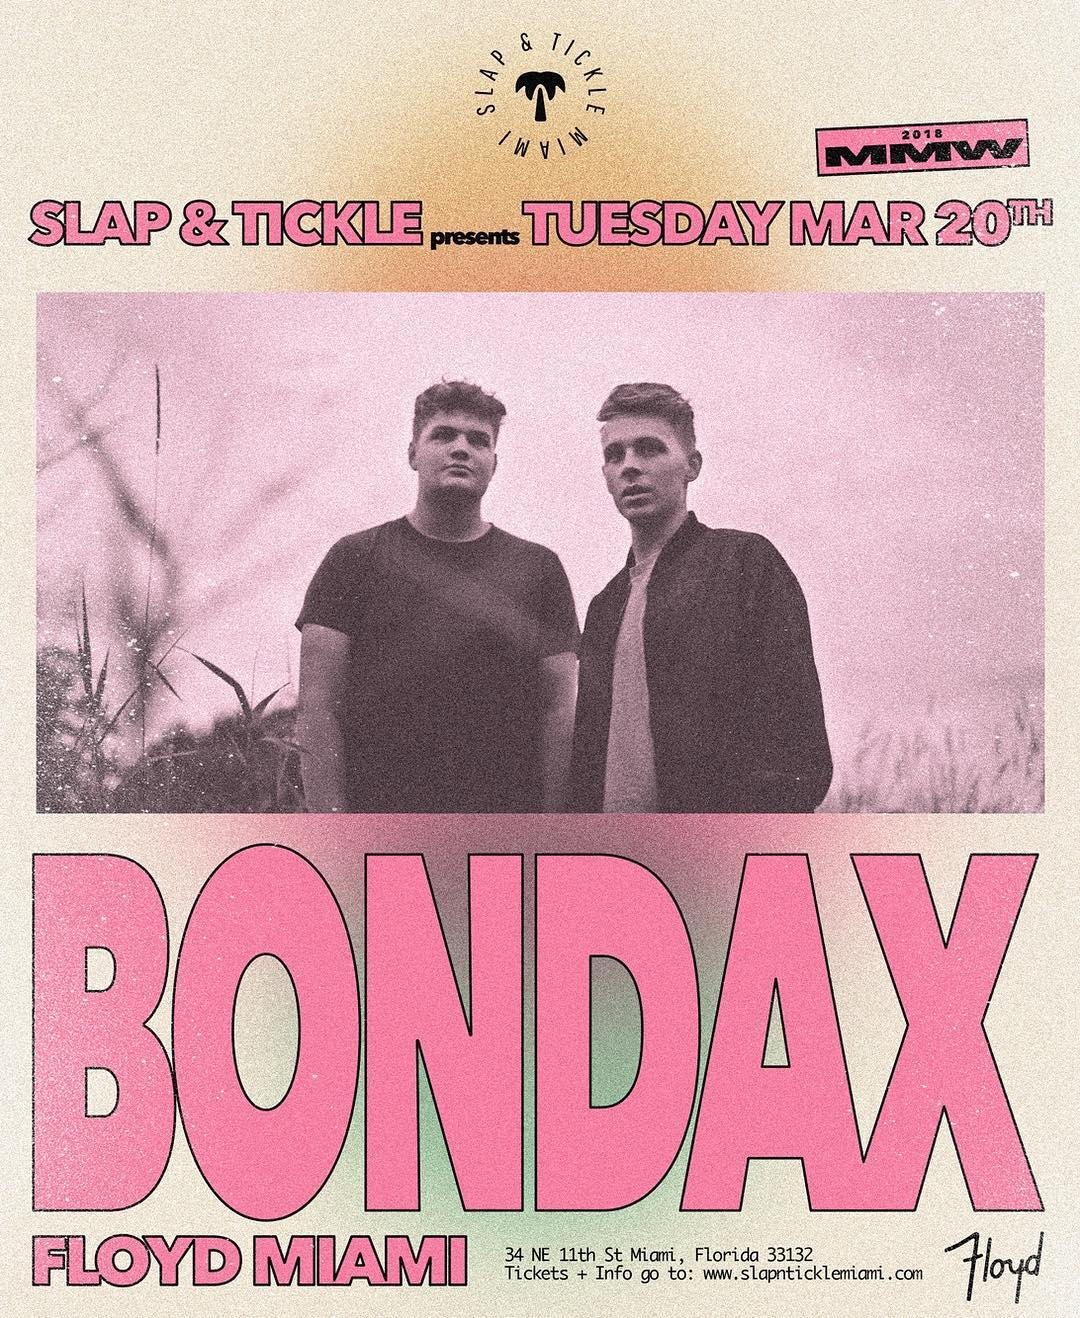 Bondax – Slap & Tickle Image